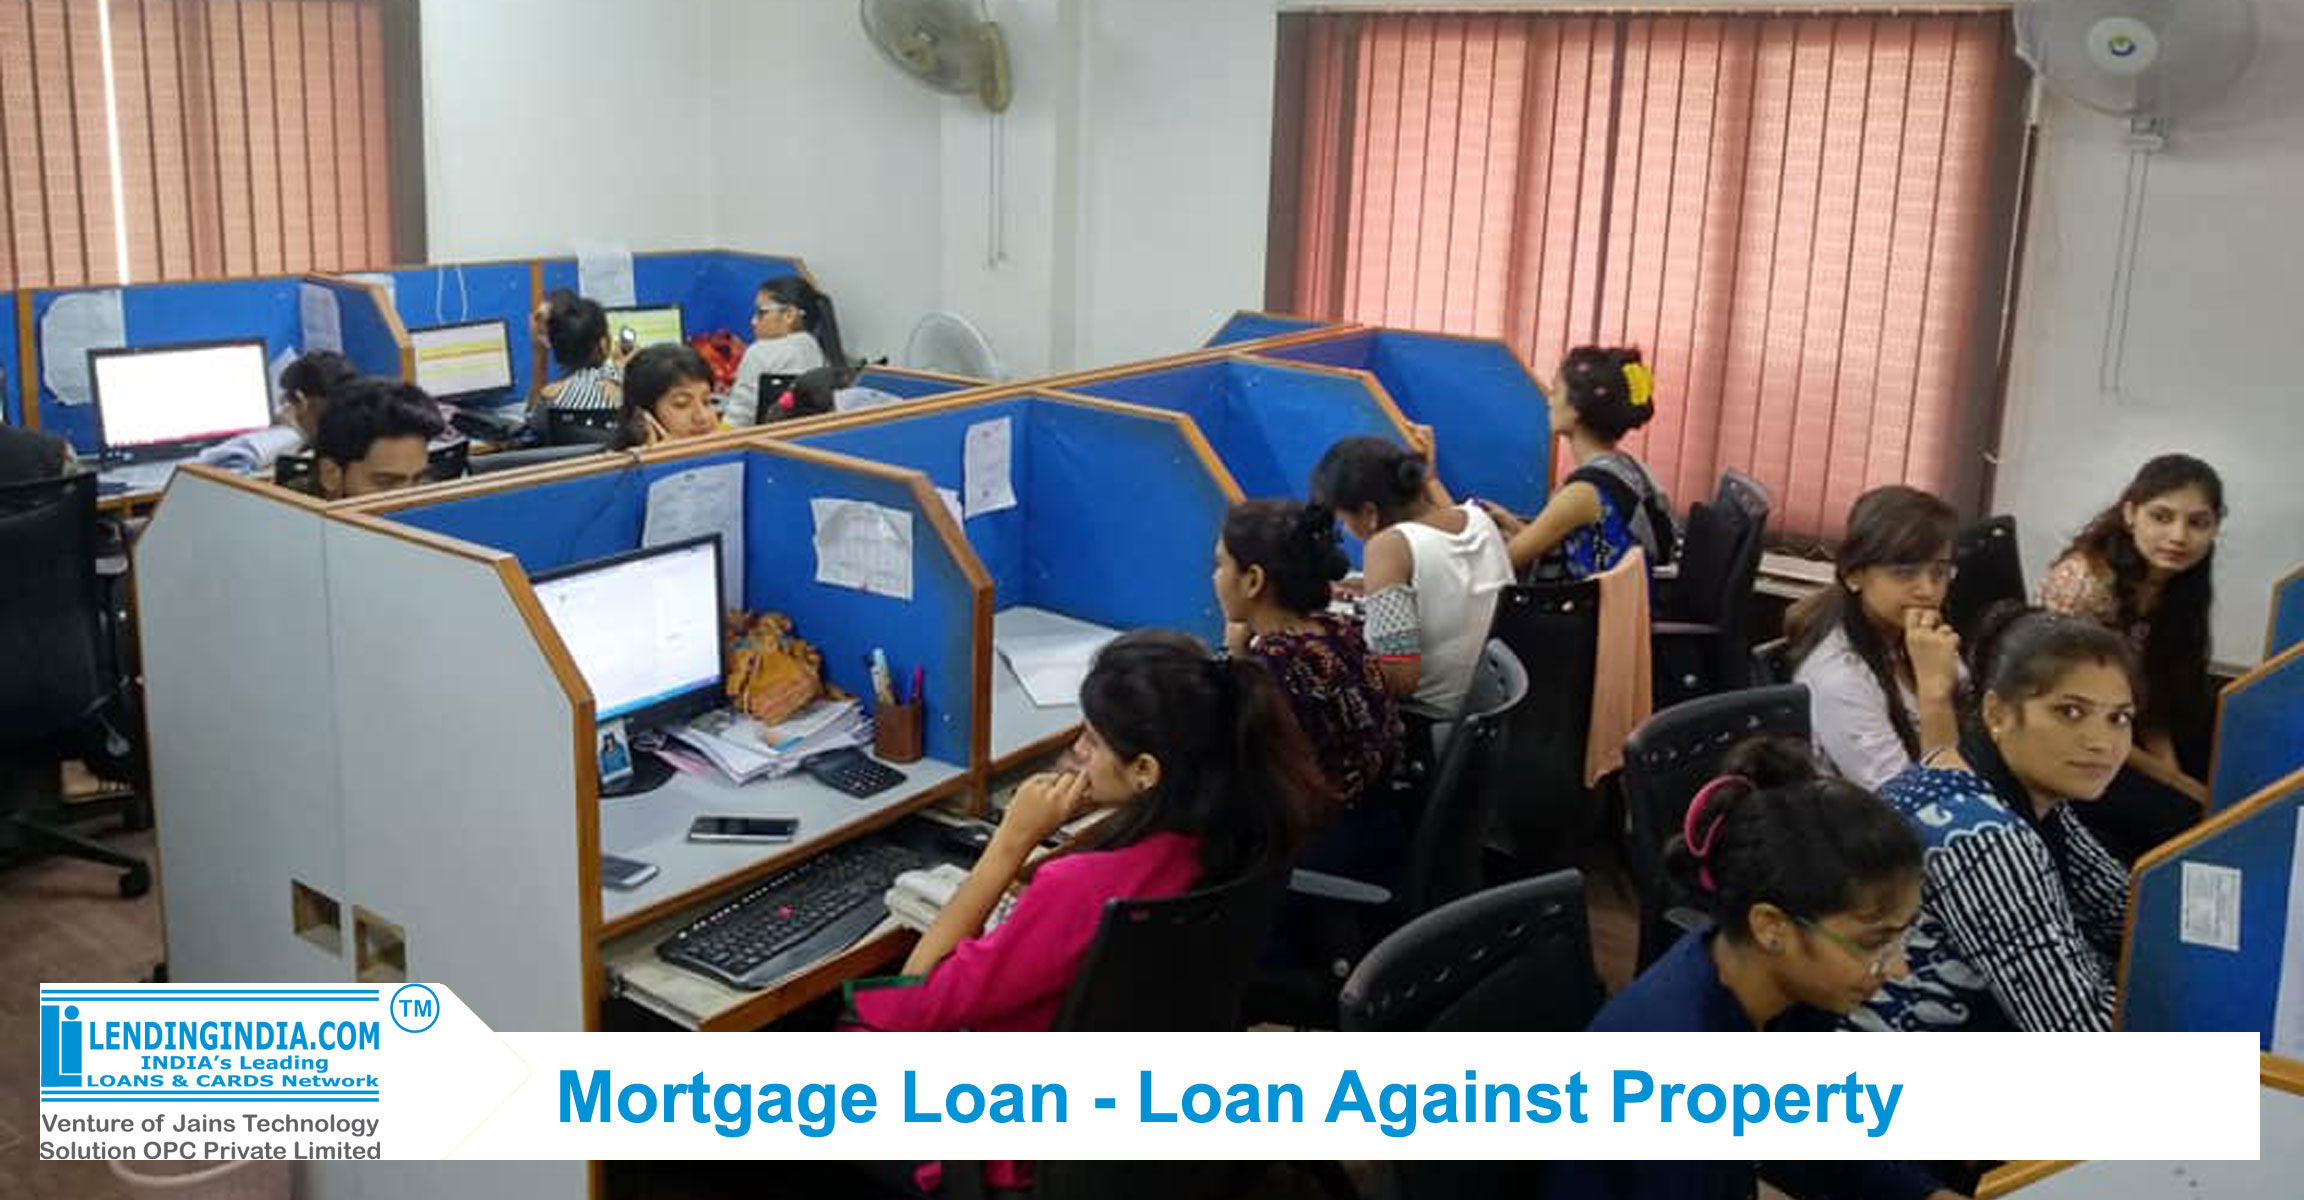 lending india loan against property mortgage loan